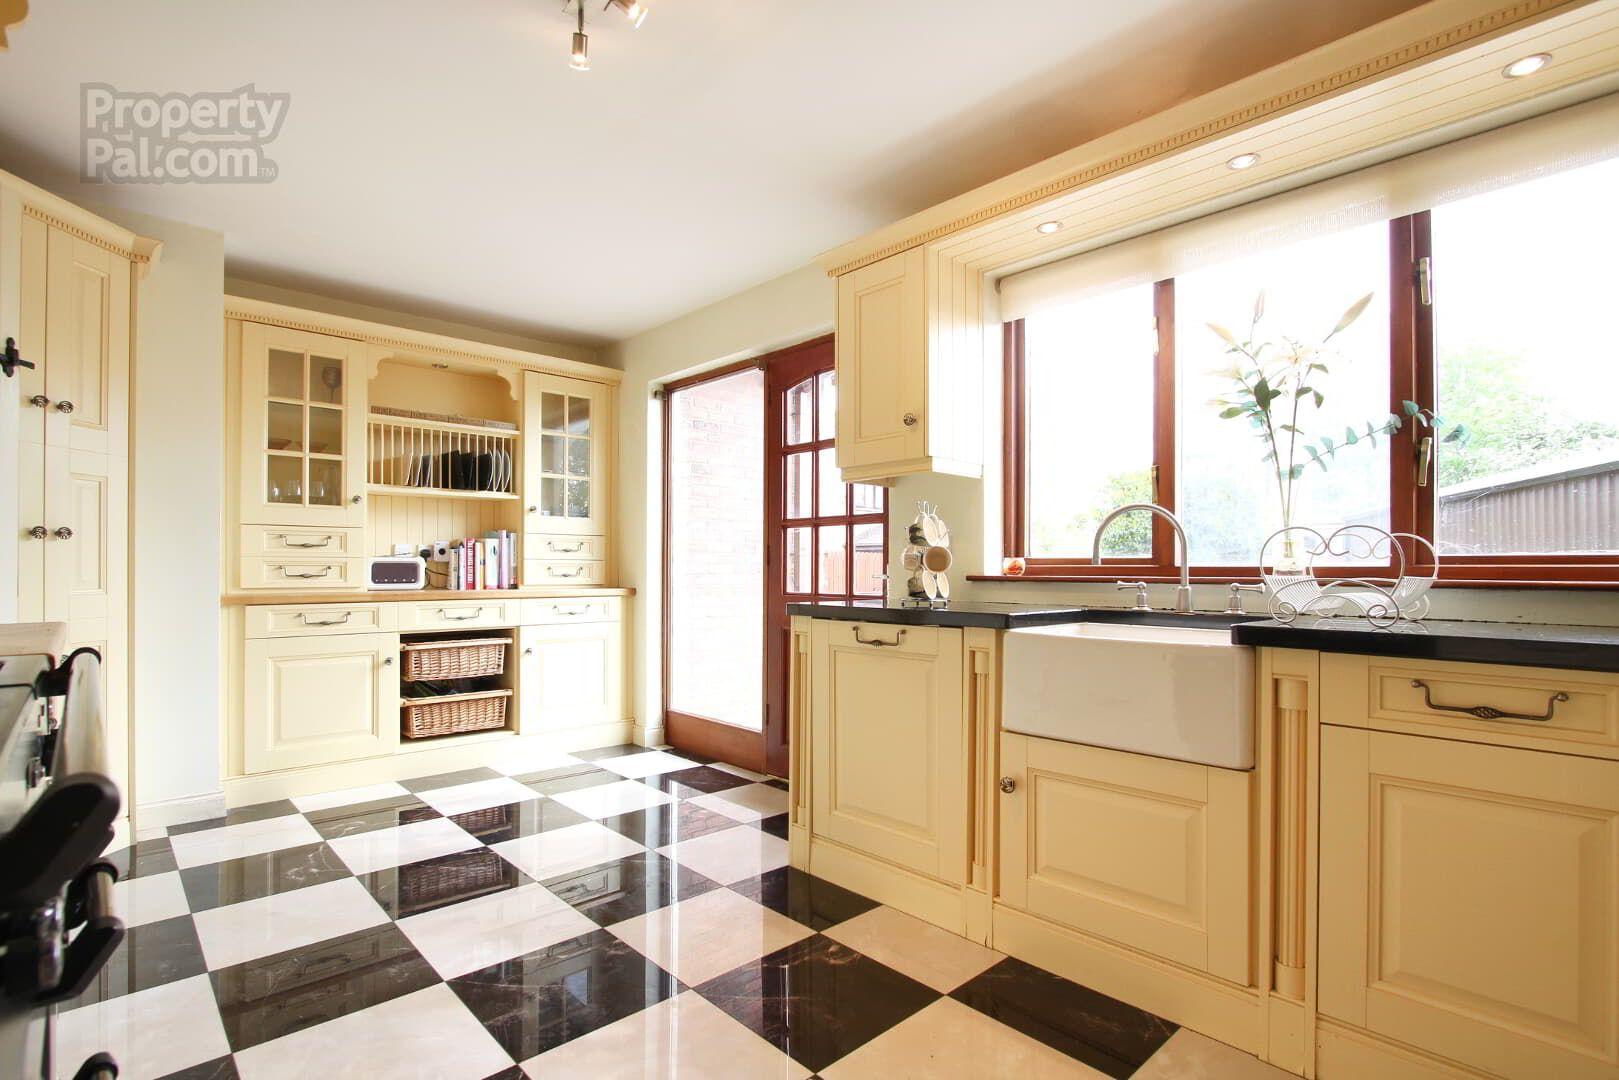 34 Upper Toberhewny Lane, Lurgan   Home, Kitchen, Property ...